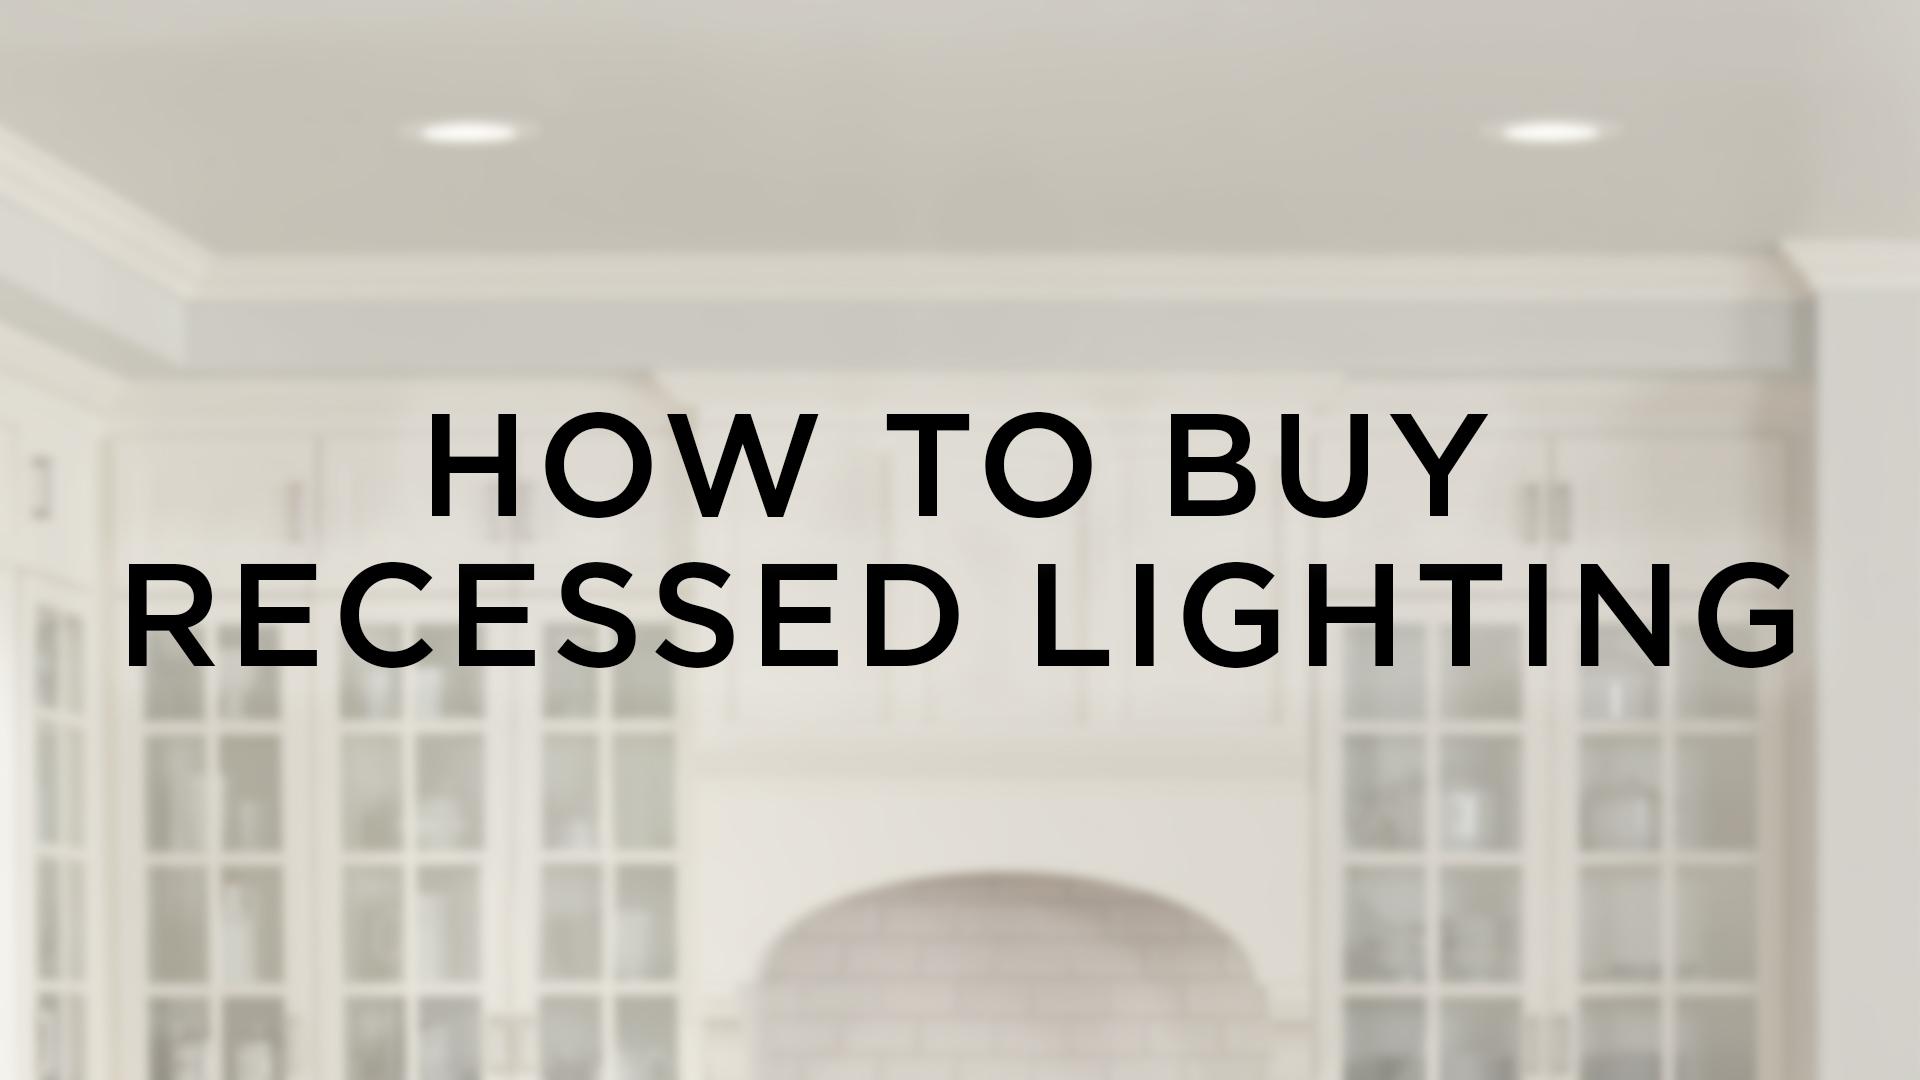 Recessed Lighting Buying Guide